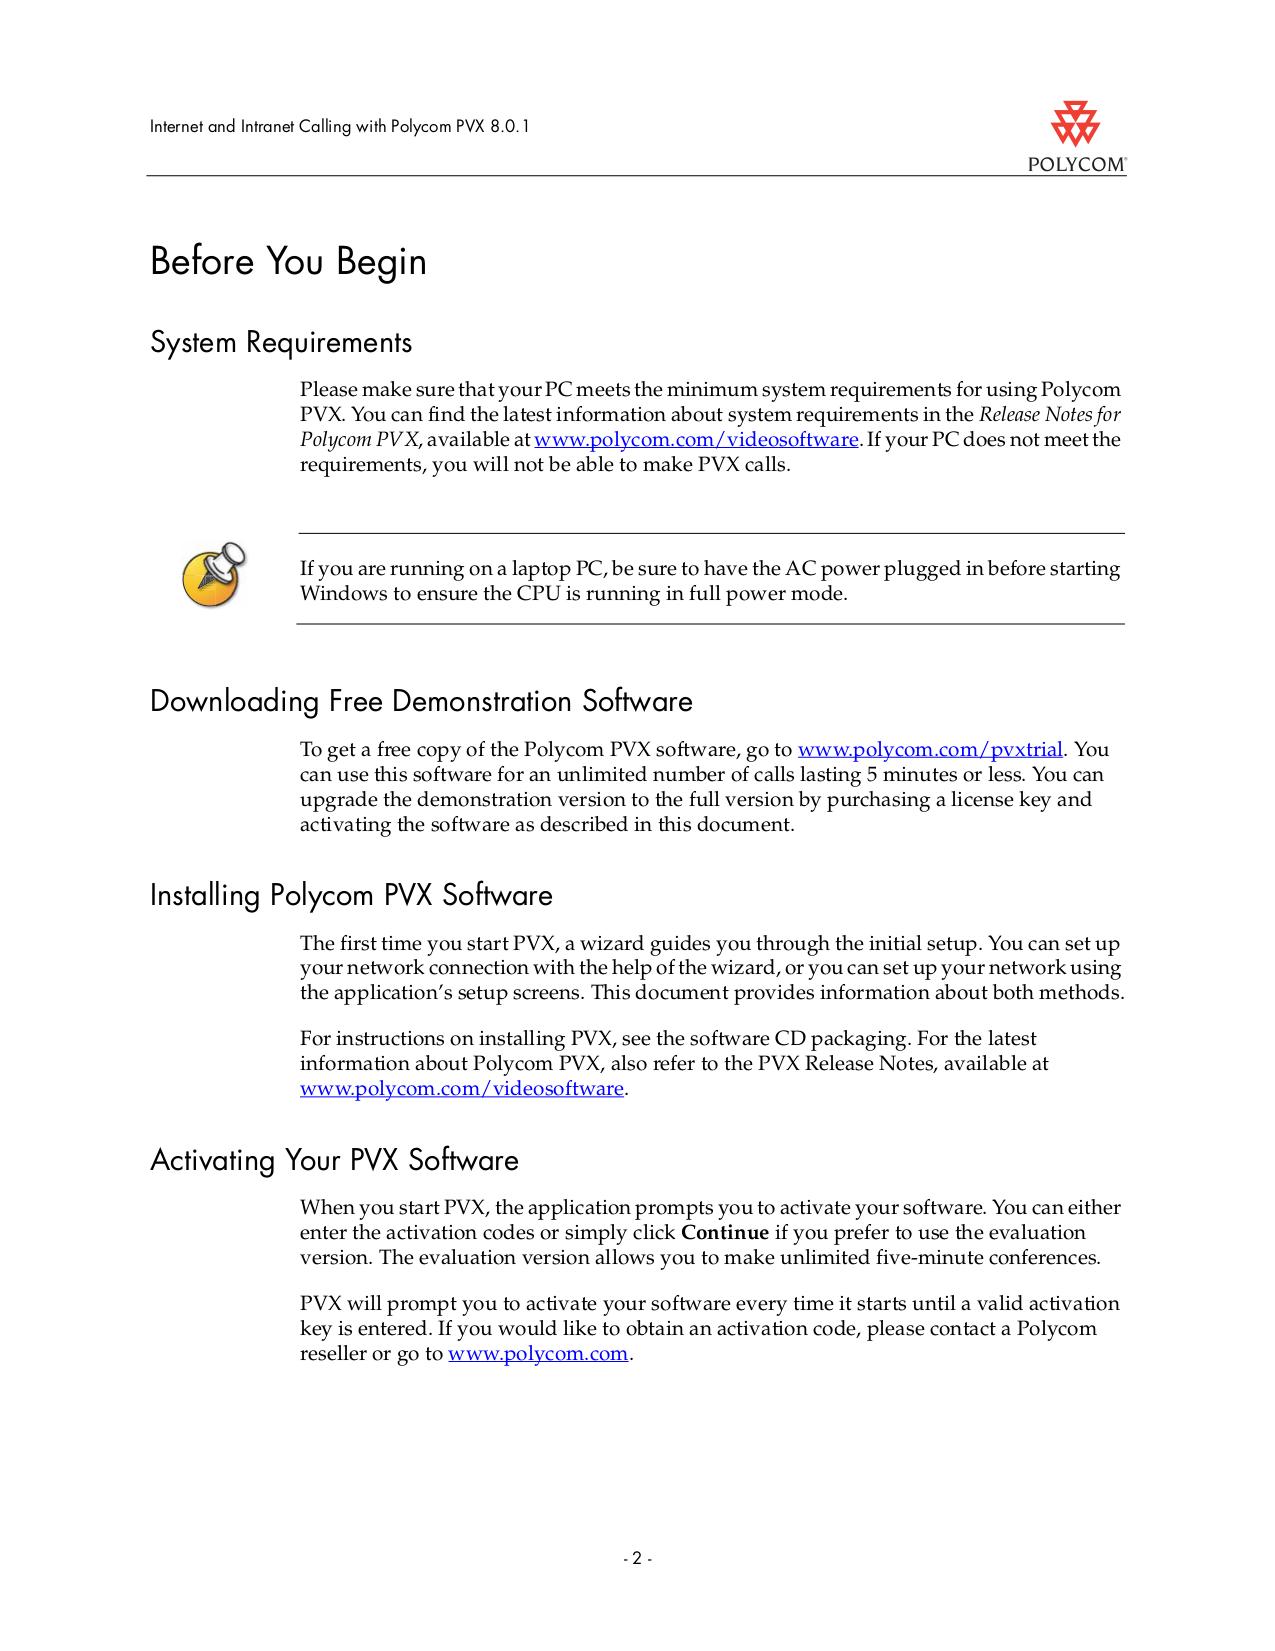 pdf manual for linksys wireless router wag54gp2 rh umlib com